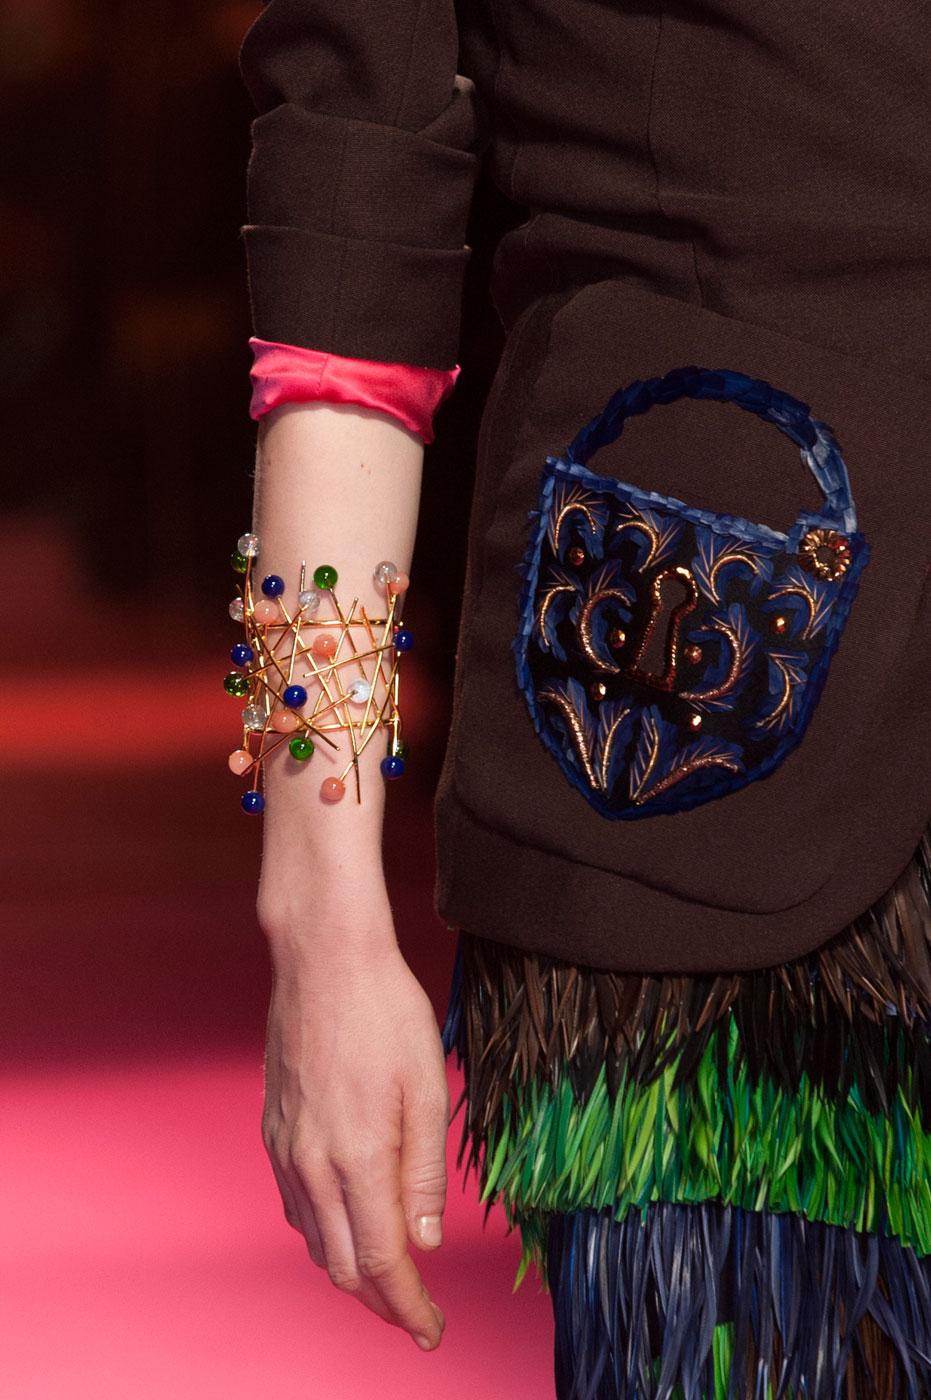 Schiaparelli-fashion-runway-show-close-ups-haute-couture-paris-spring-summer-2015-the-impression-22